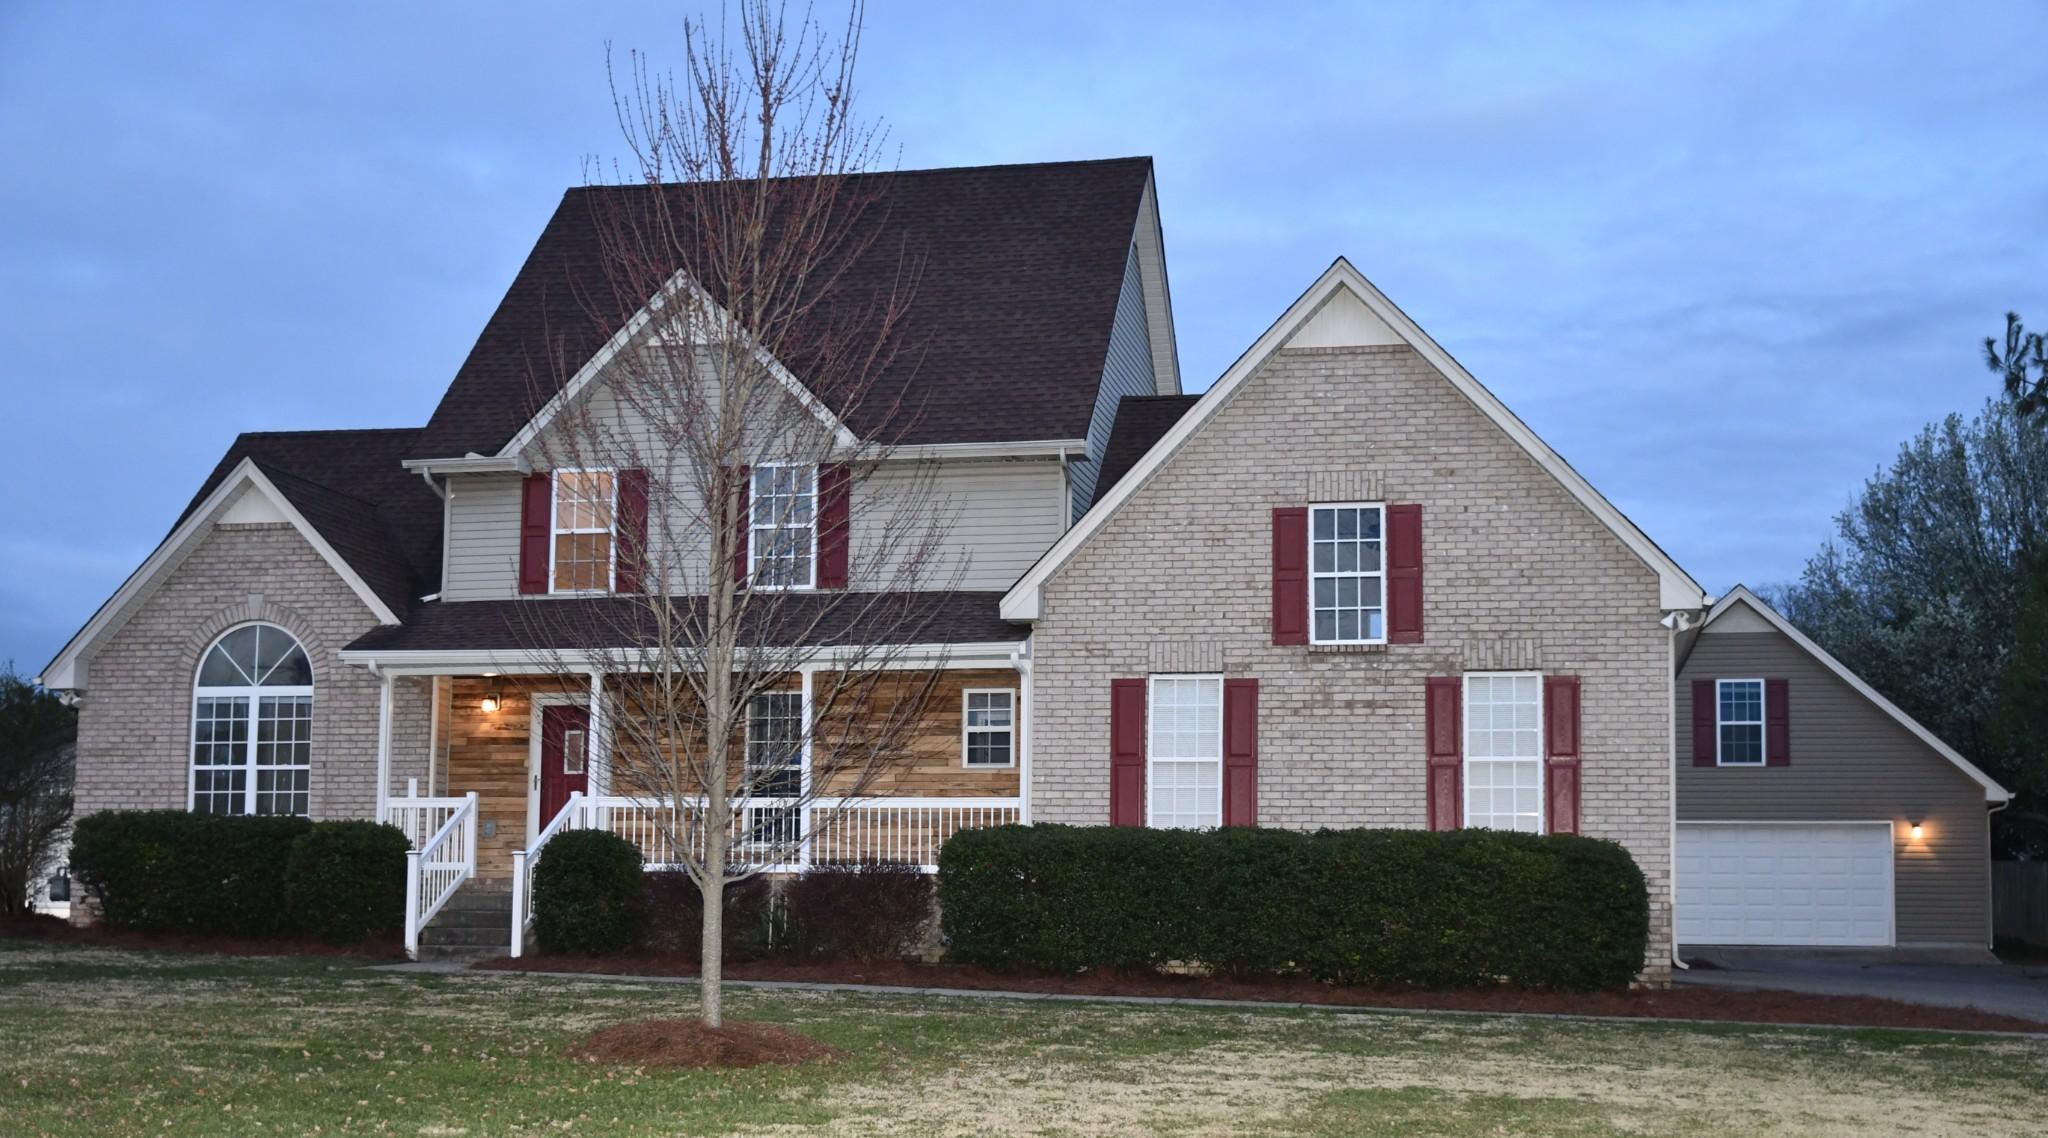 113 Spicer Ct, White House, TN 37188 - White House, TN real estate listing